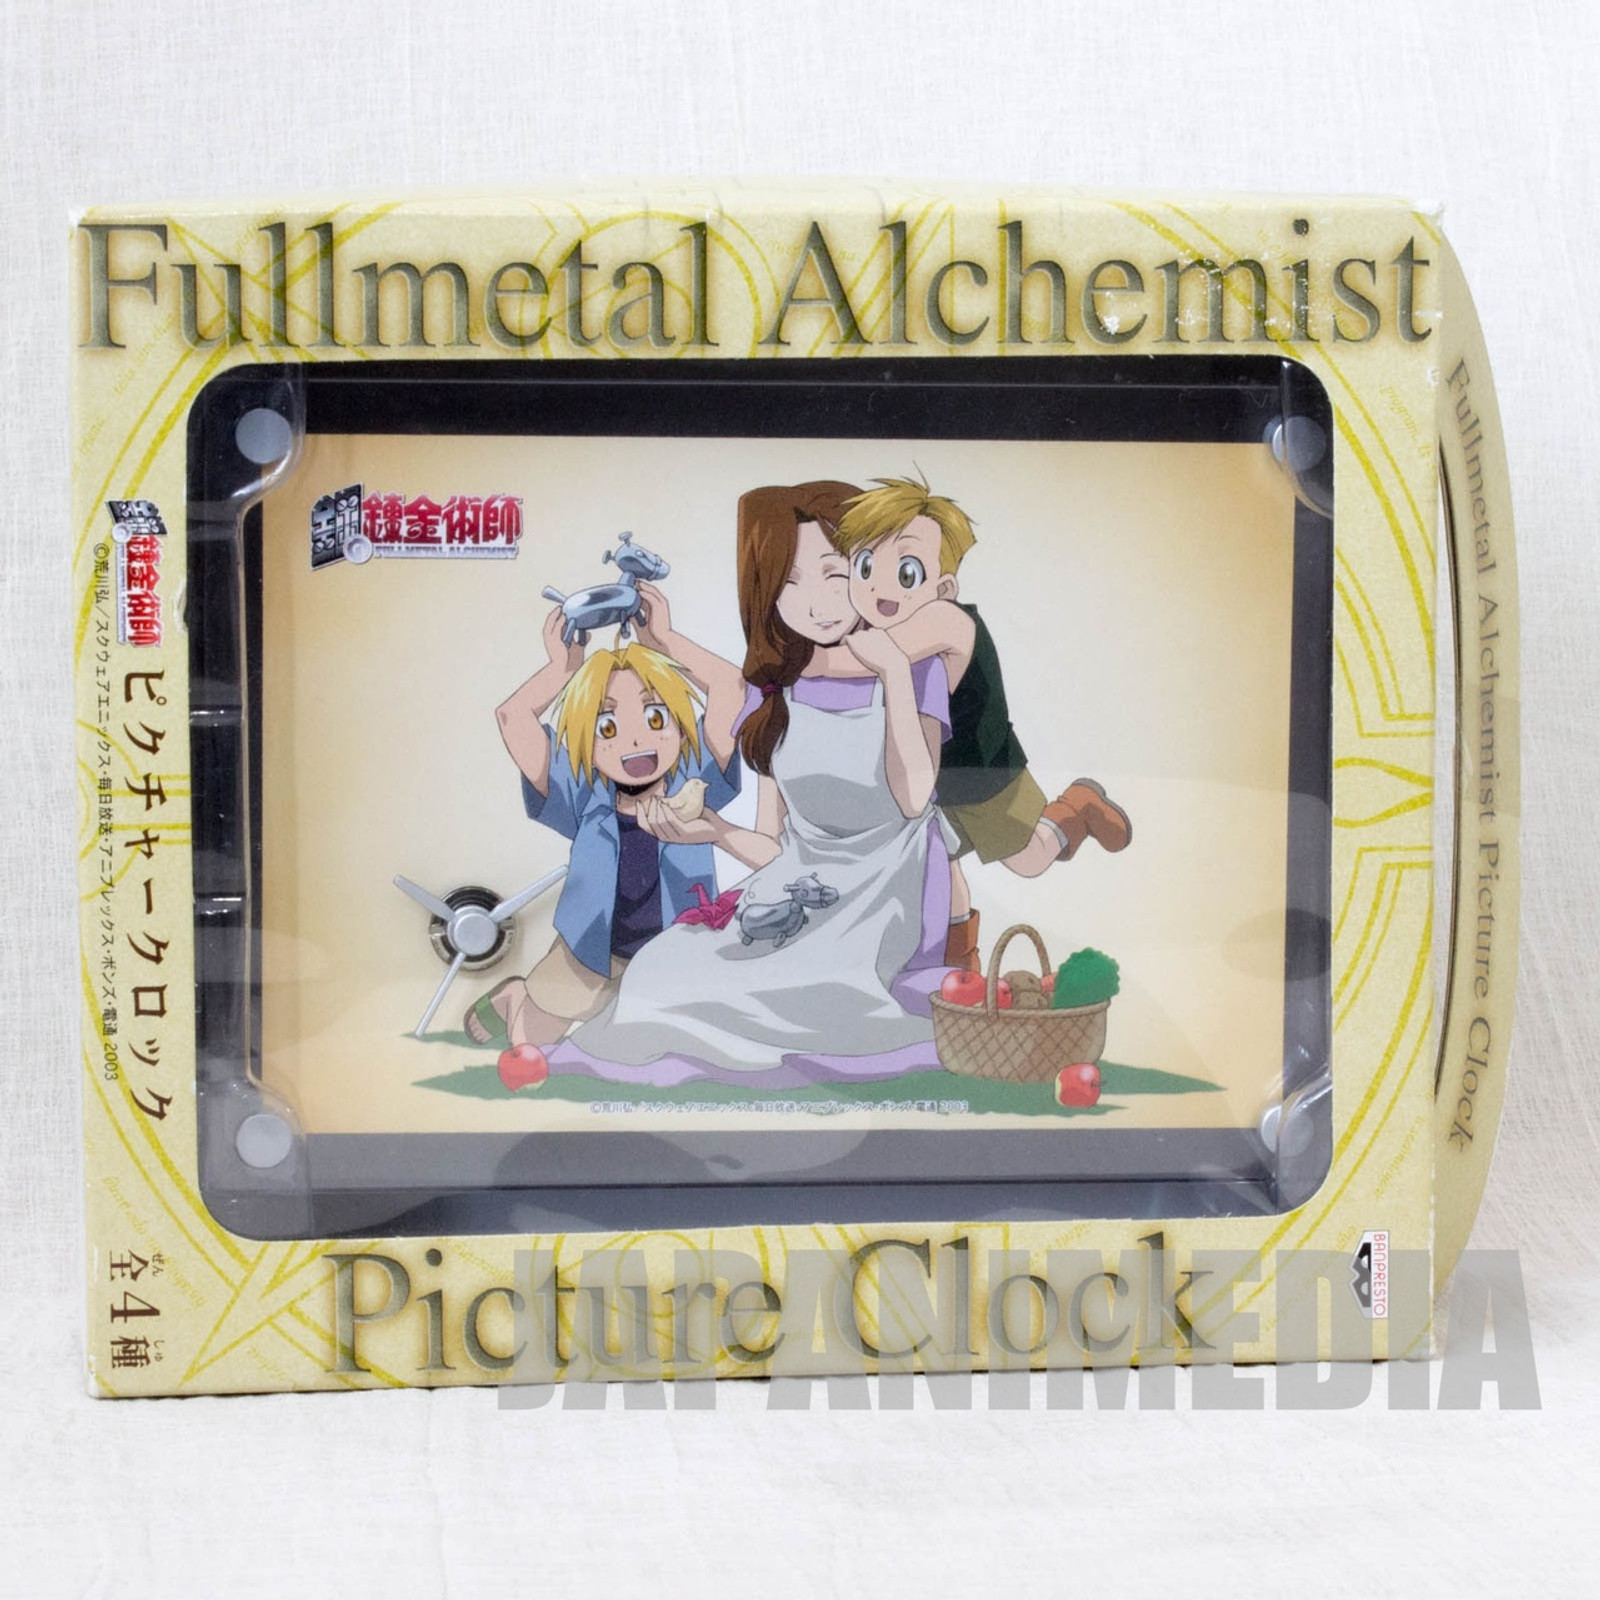 Fullmetal Alchemist Childhood Picture Desktop Clock JAPAN ANIME MANGA